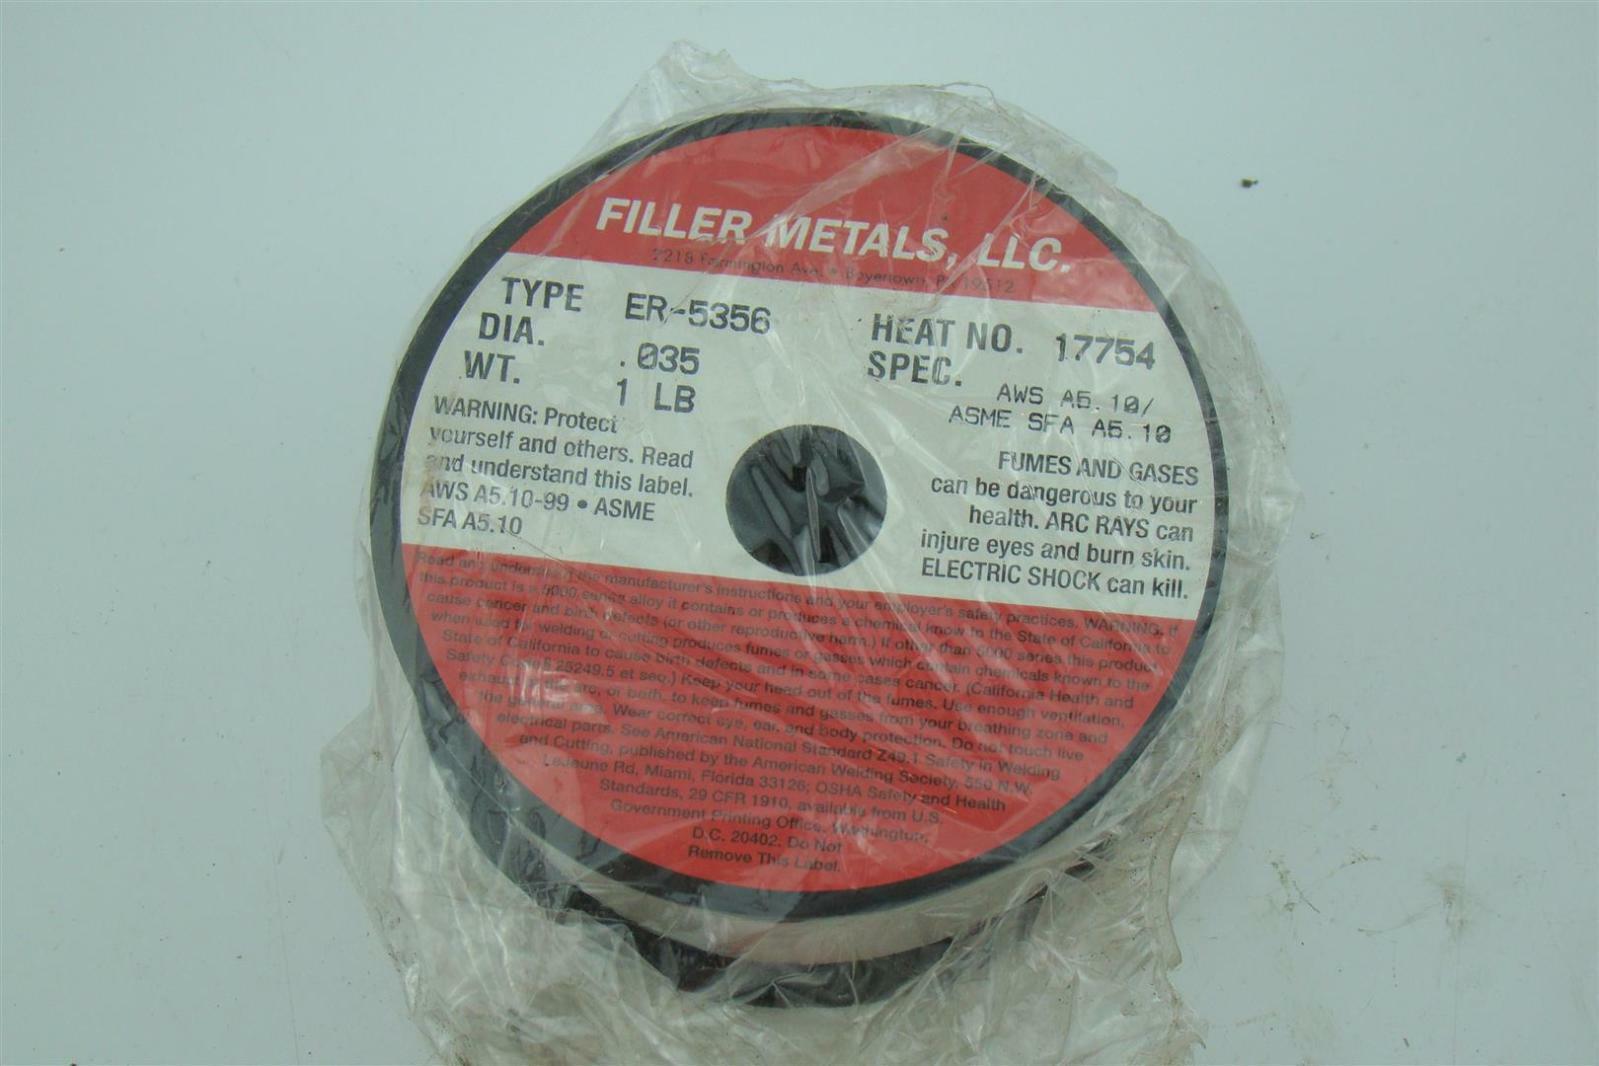 Filler Metals, LLC Aluminum Welding Wire ER-5356 | eBay